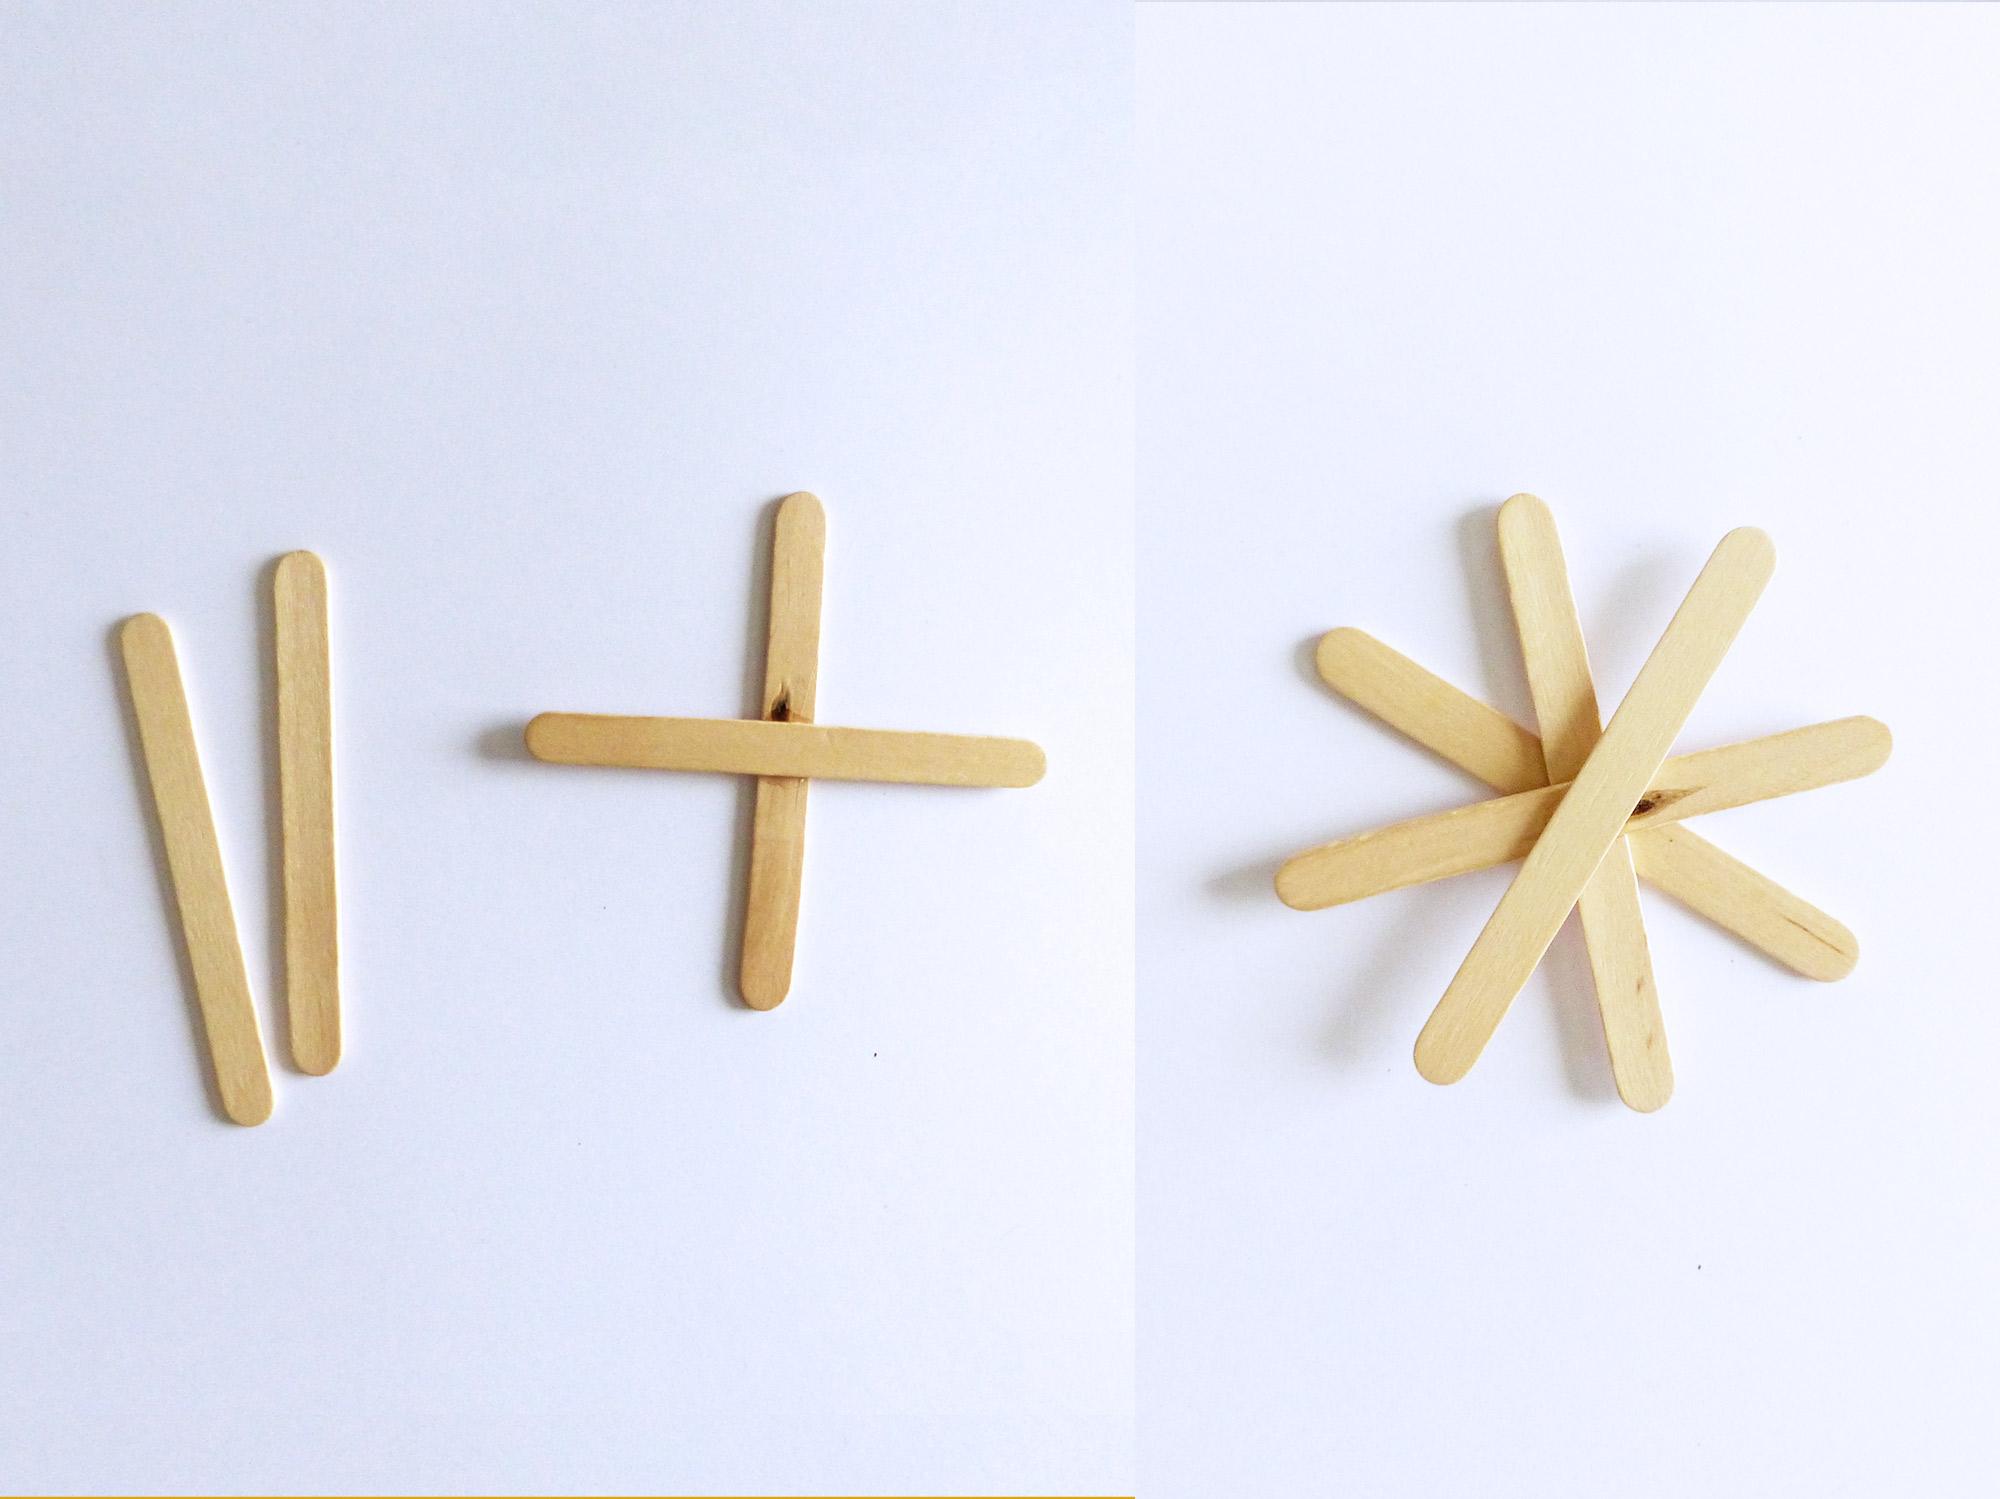 Autour de Marine - DIY Noël guirlande papier